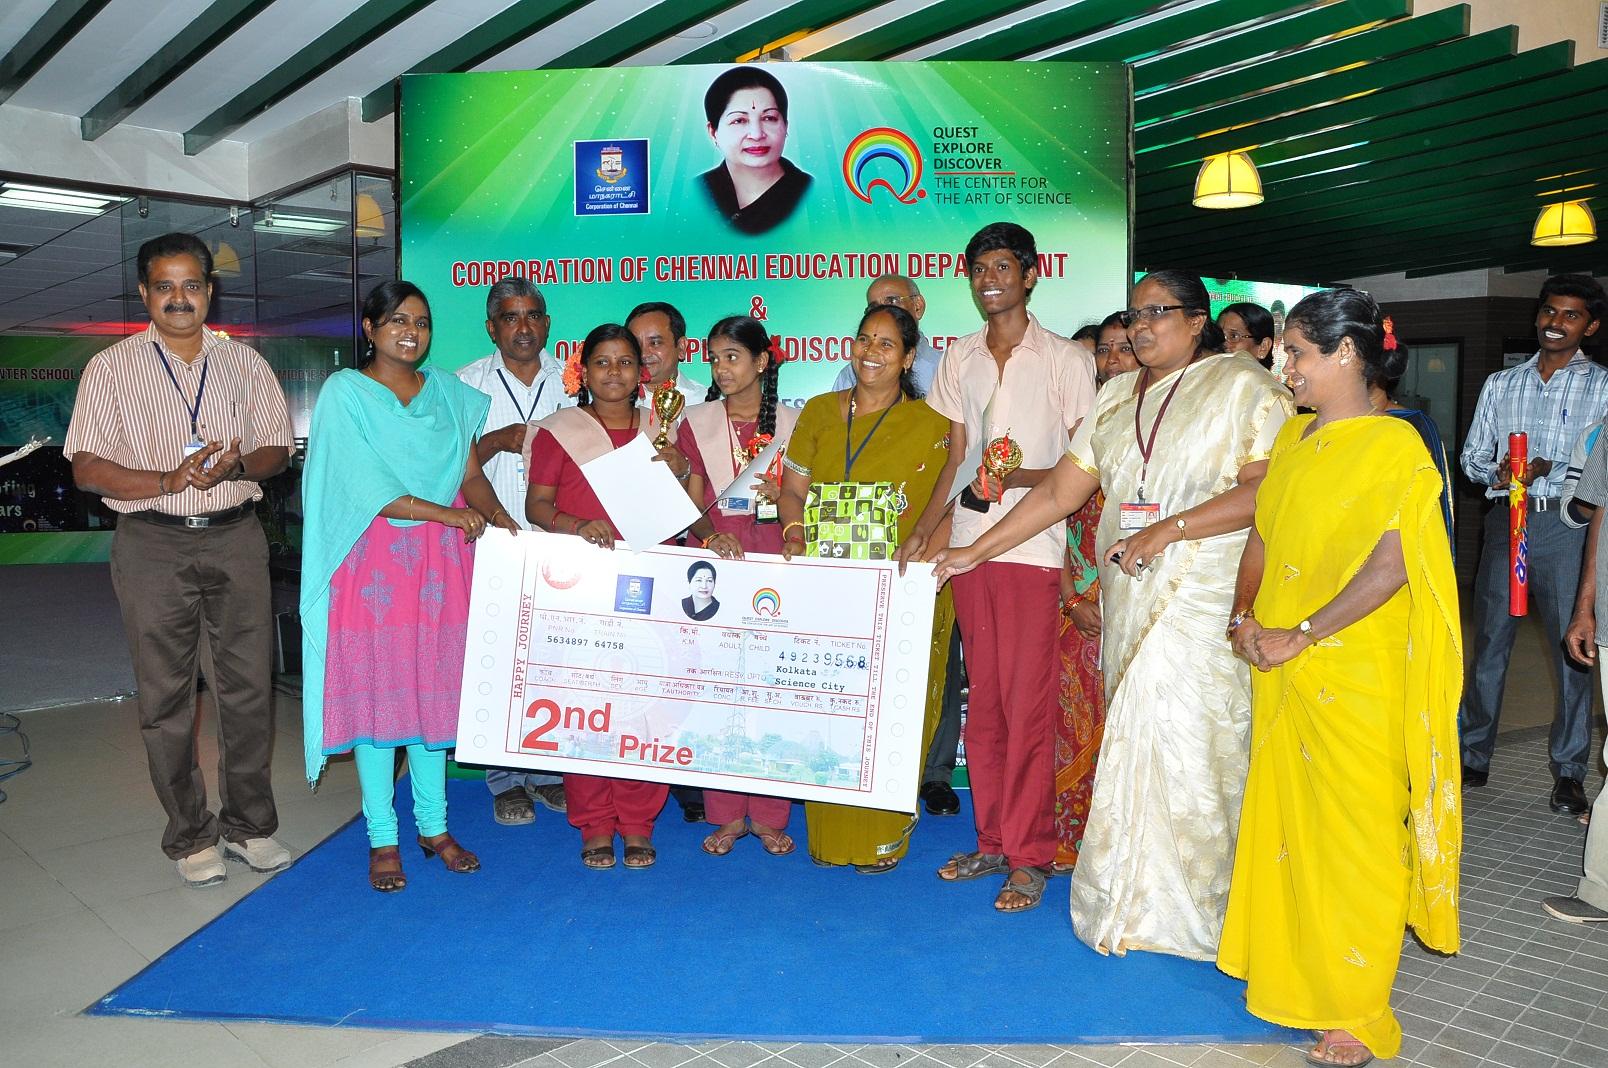 2nd Prize: CMS Erikarai - L. Janaki 8th, R . Roja 8th, s. Karthikeyan 8th, With Qed Everest Edusis& Solutions Pvt Ltd Chairman Mr.Krishana And Lalitha IAS